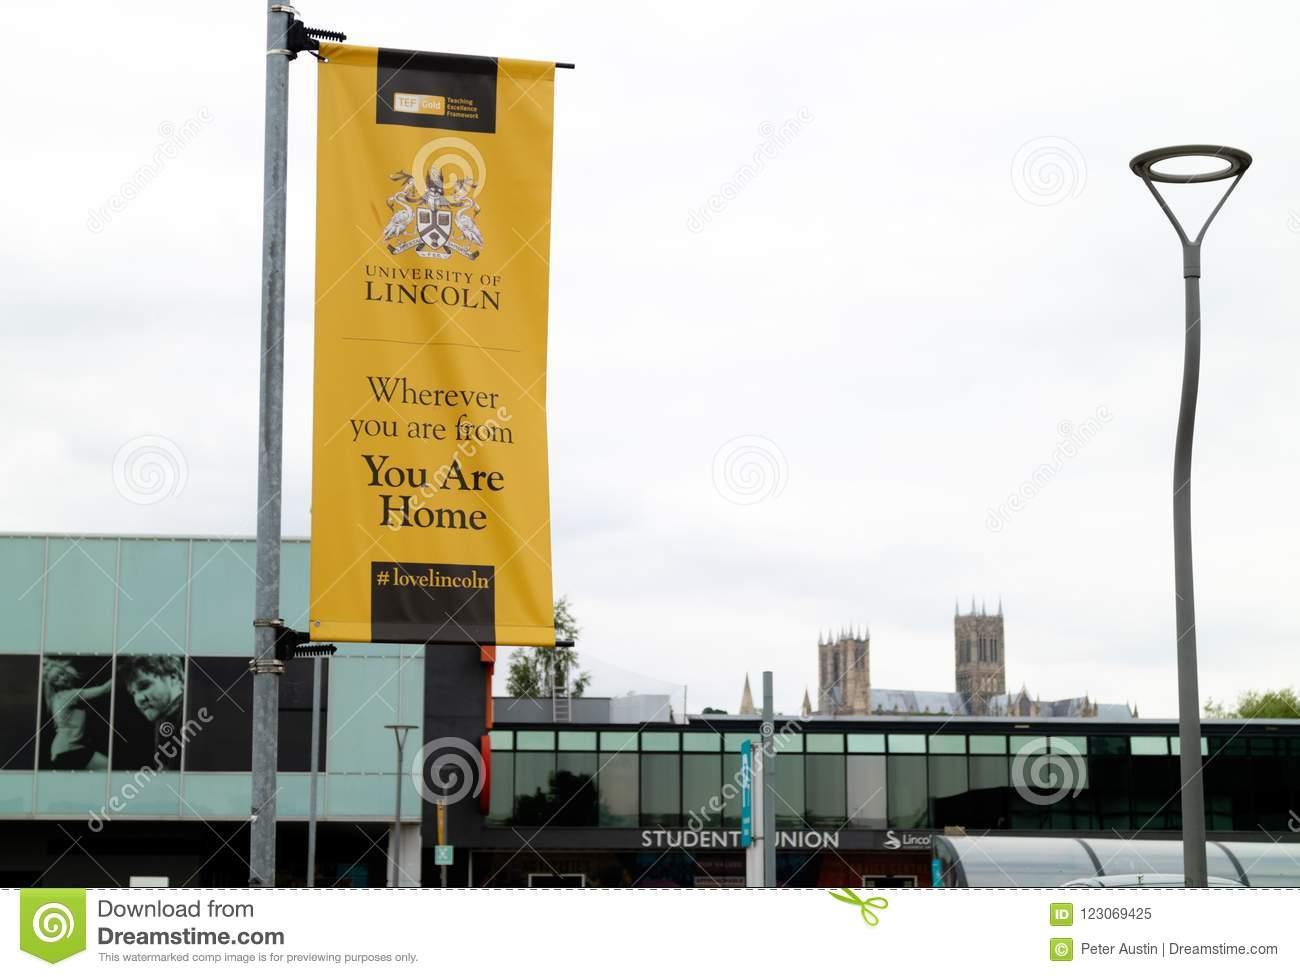 University of Lincoln banner